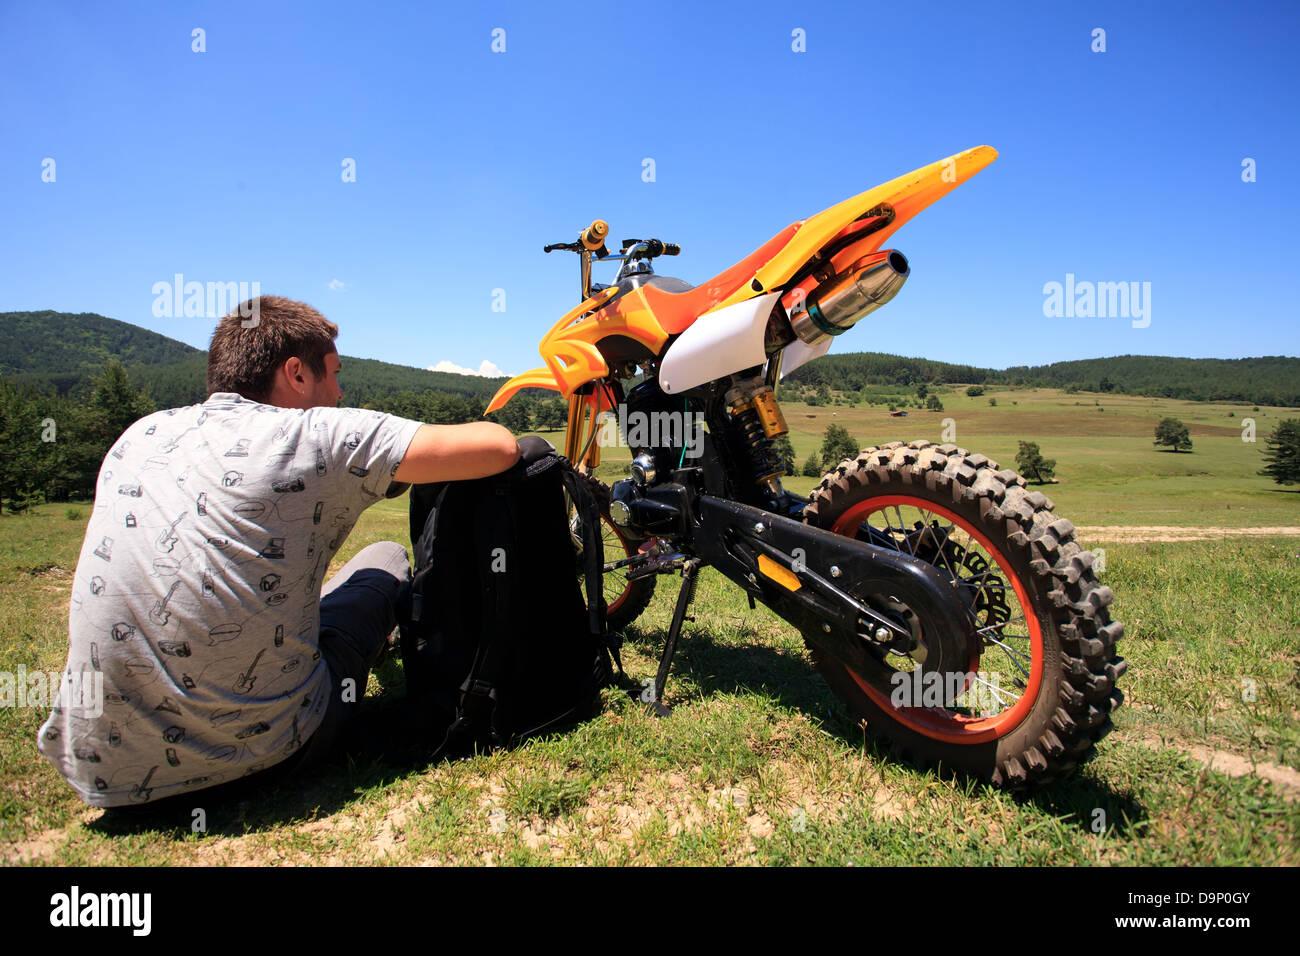 man siting near dirt bike in summer field - Stock Image